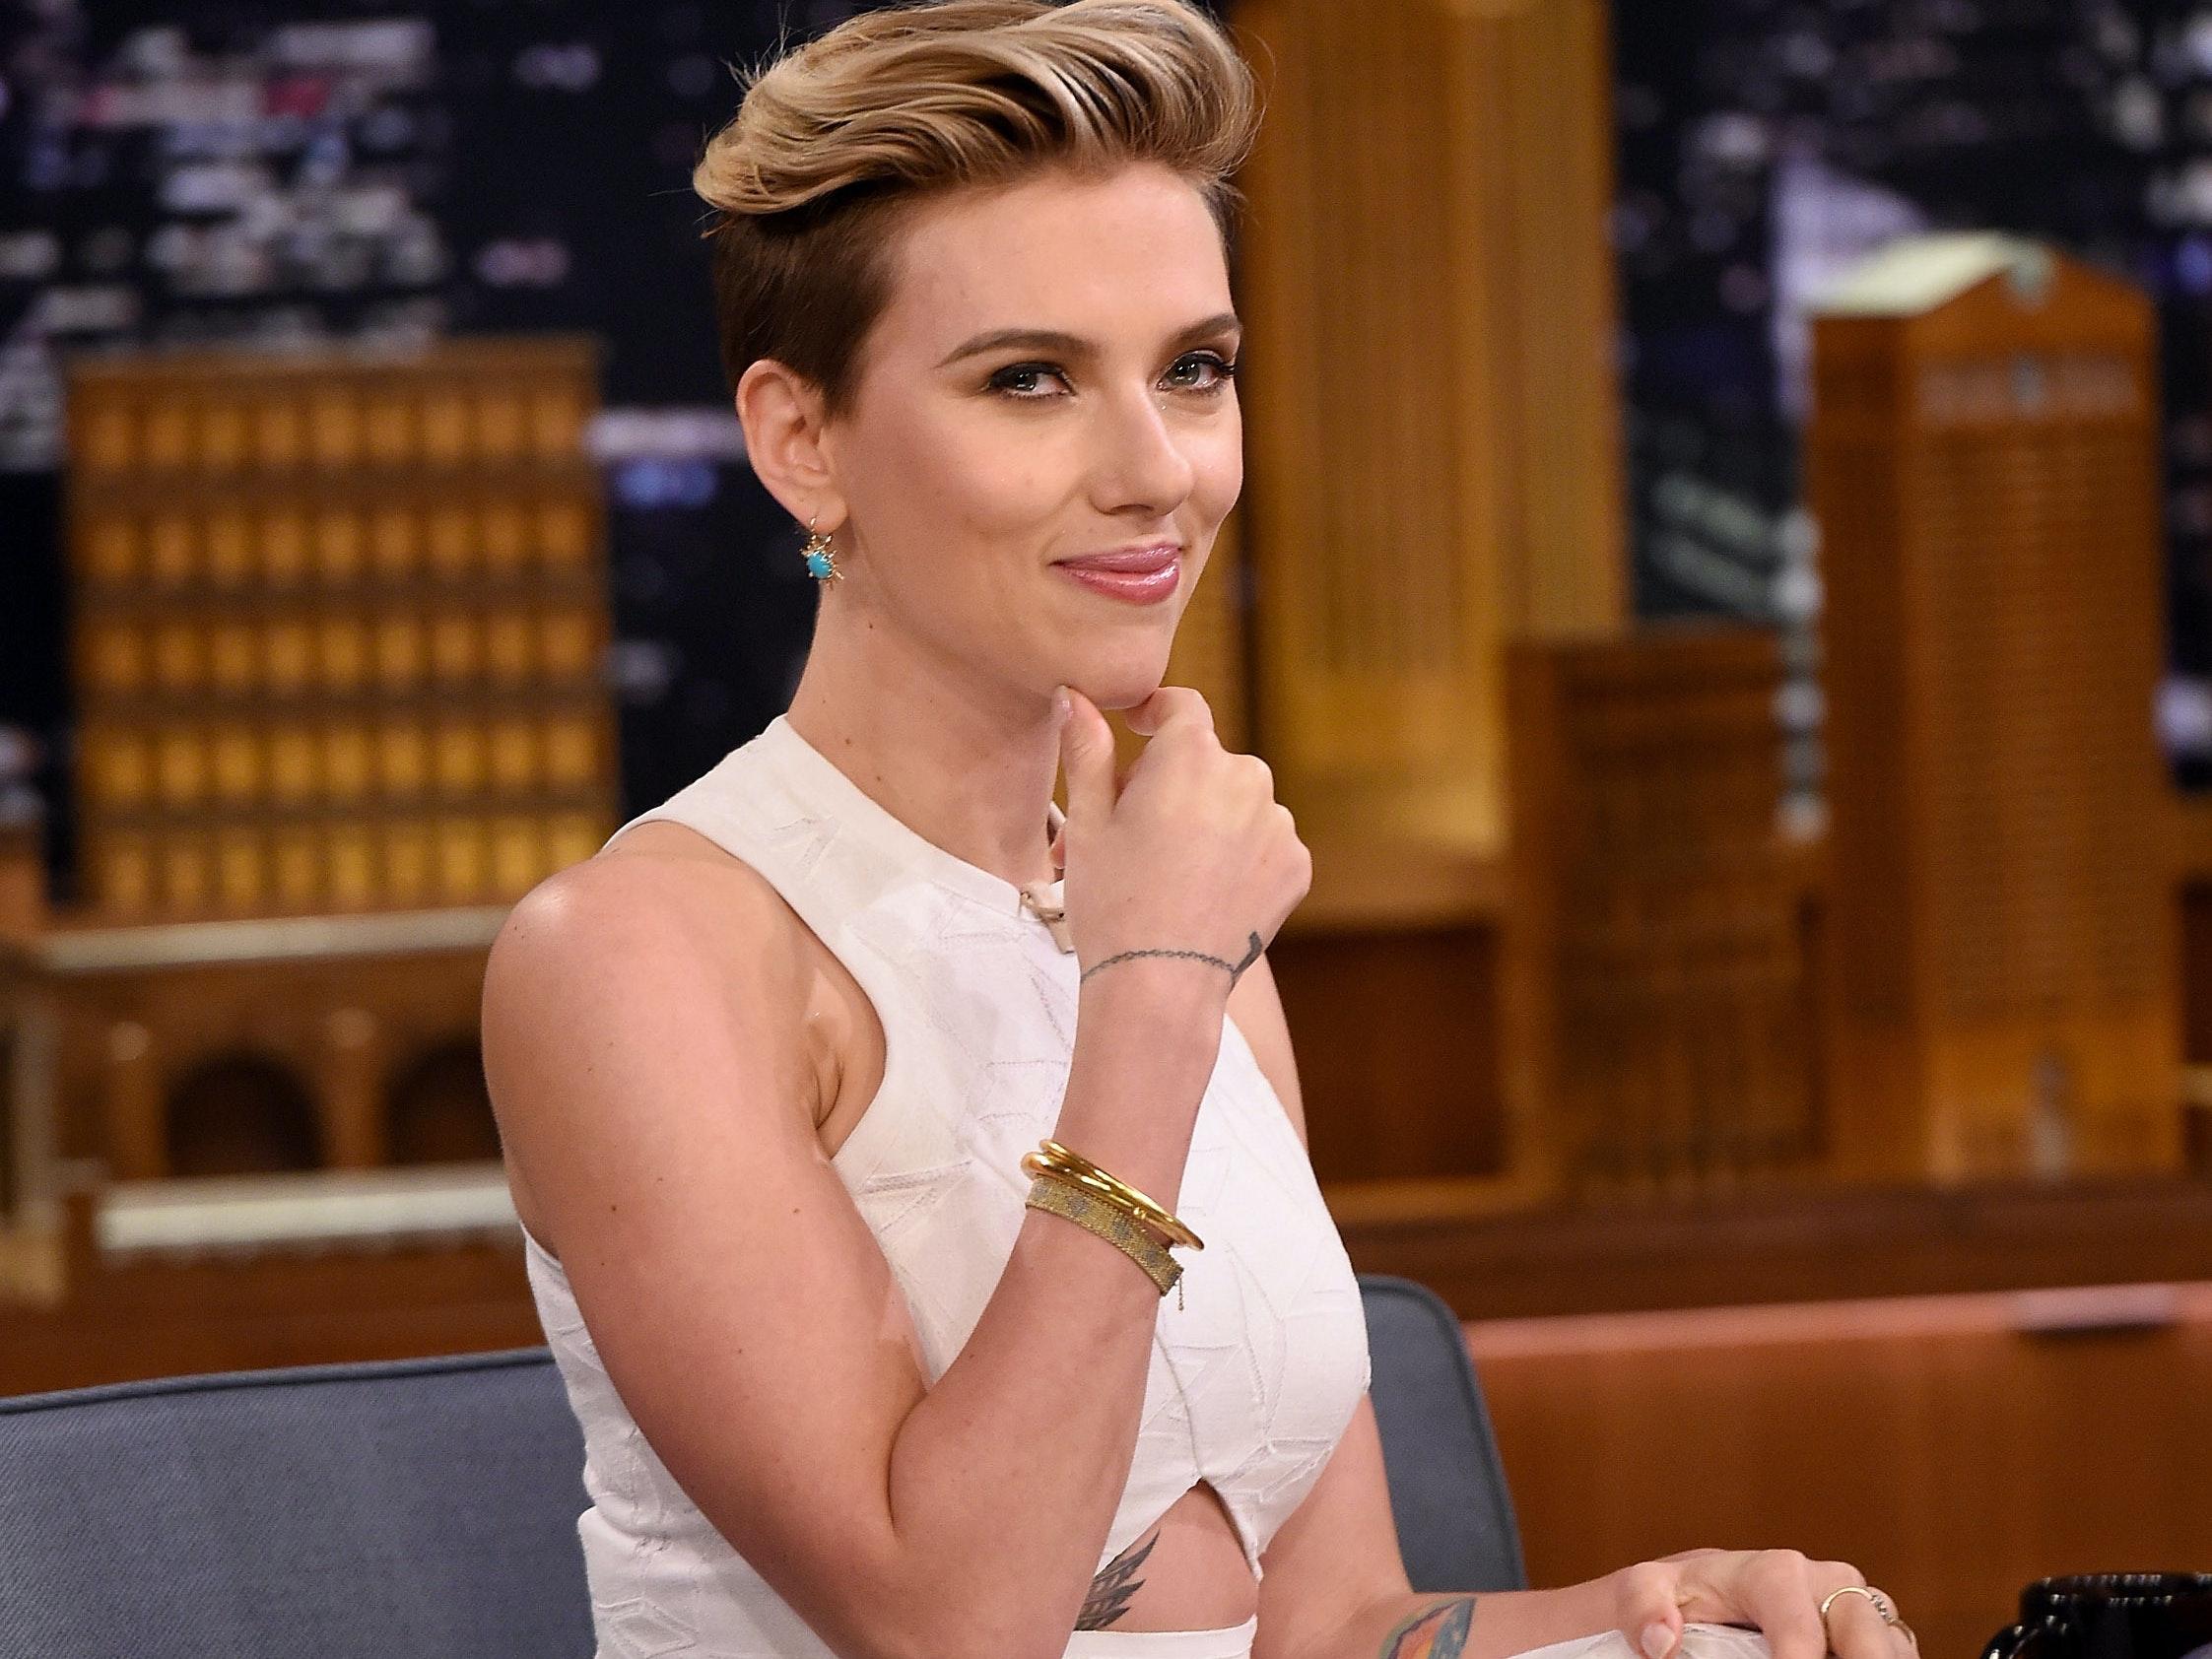 'Ghost in the Shell' Filmmakers Tried Digital Yellowface on Scarlett Johansson